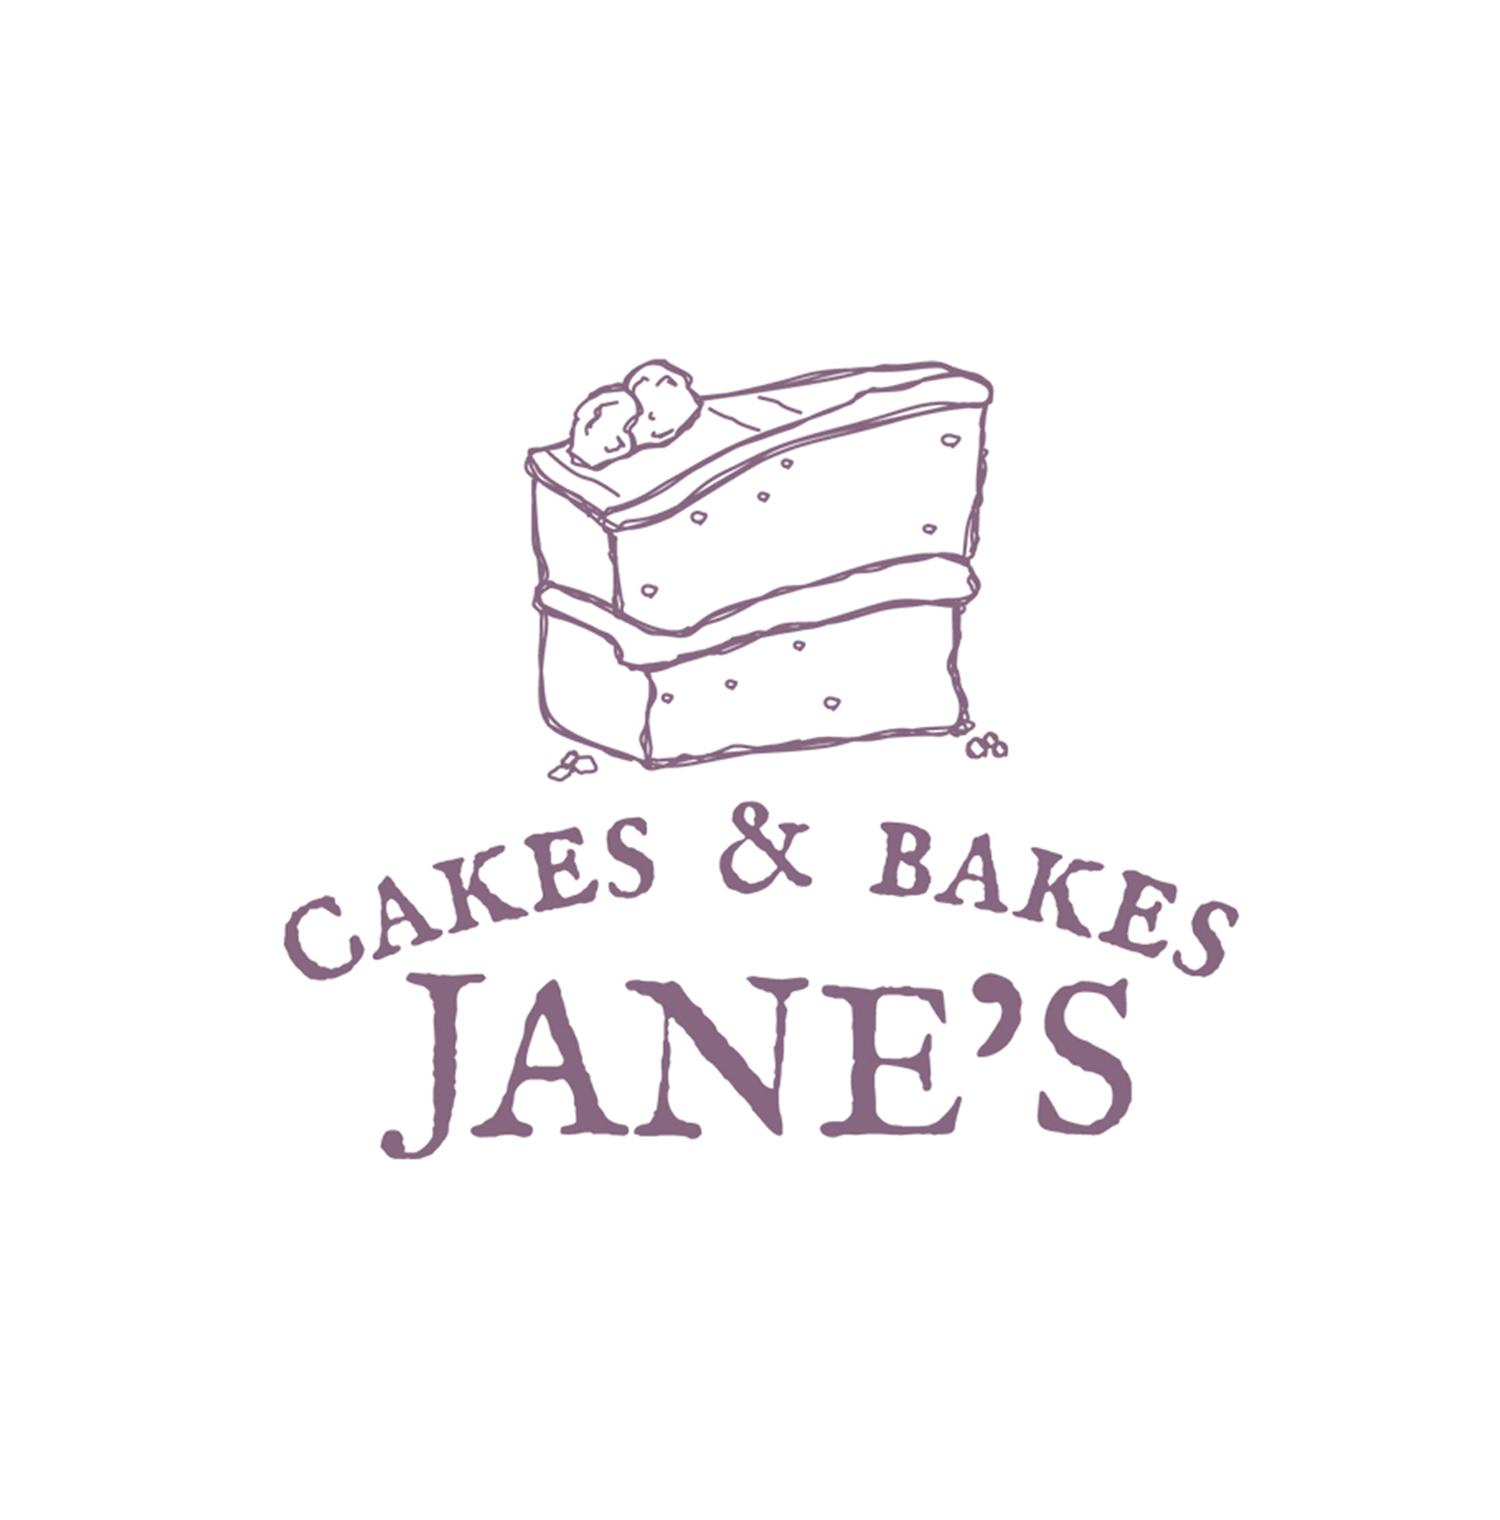 Janes Bakes & Cakes logo 720